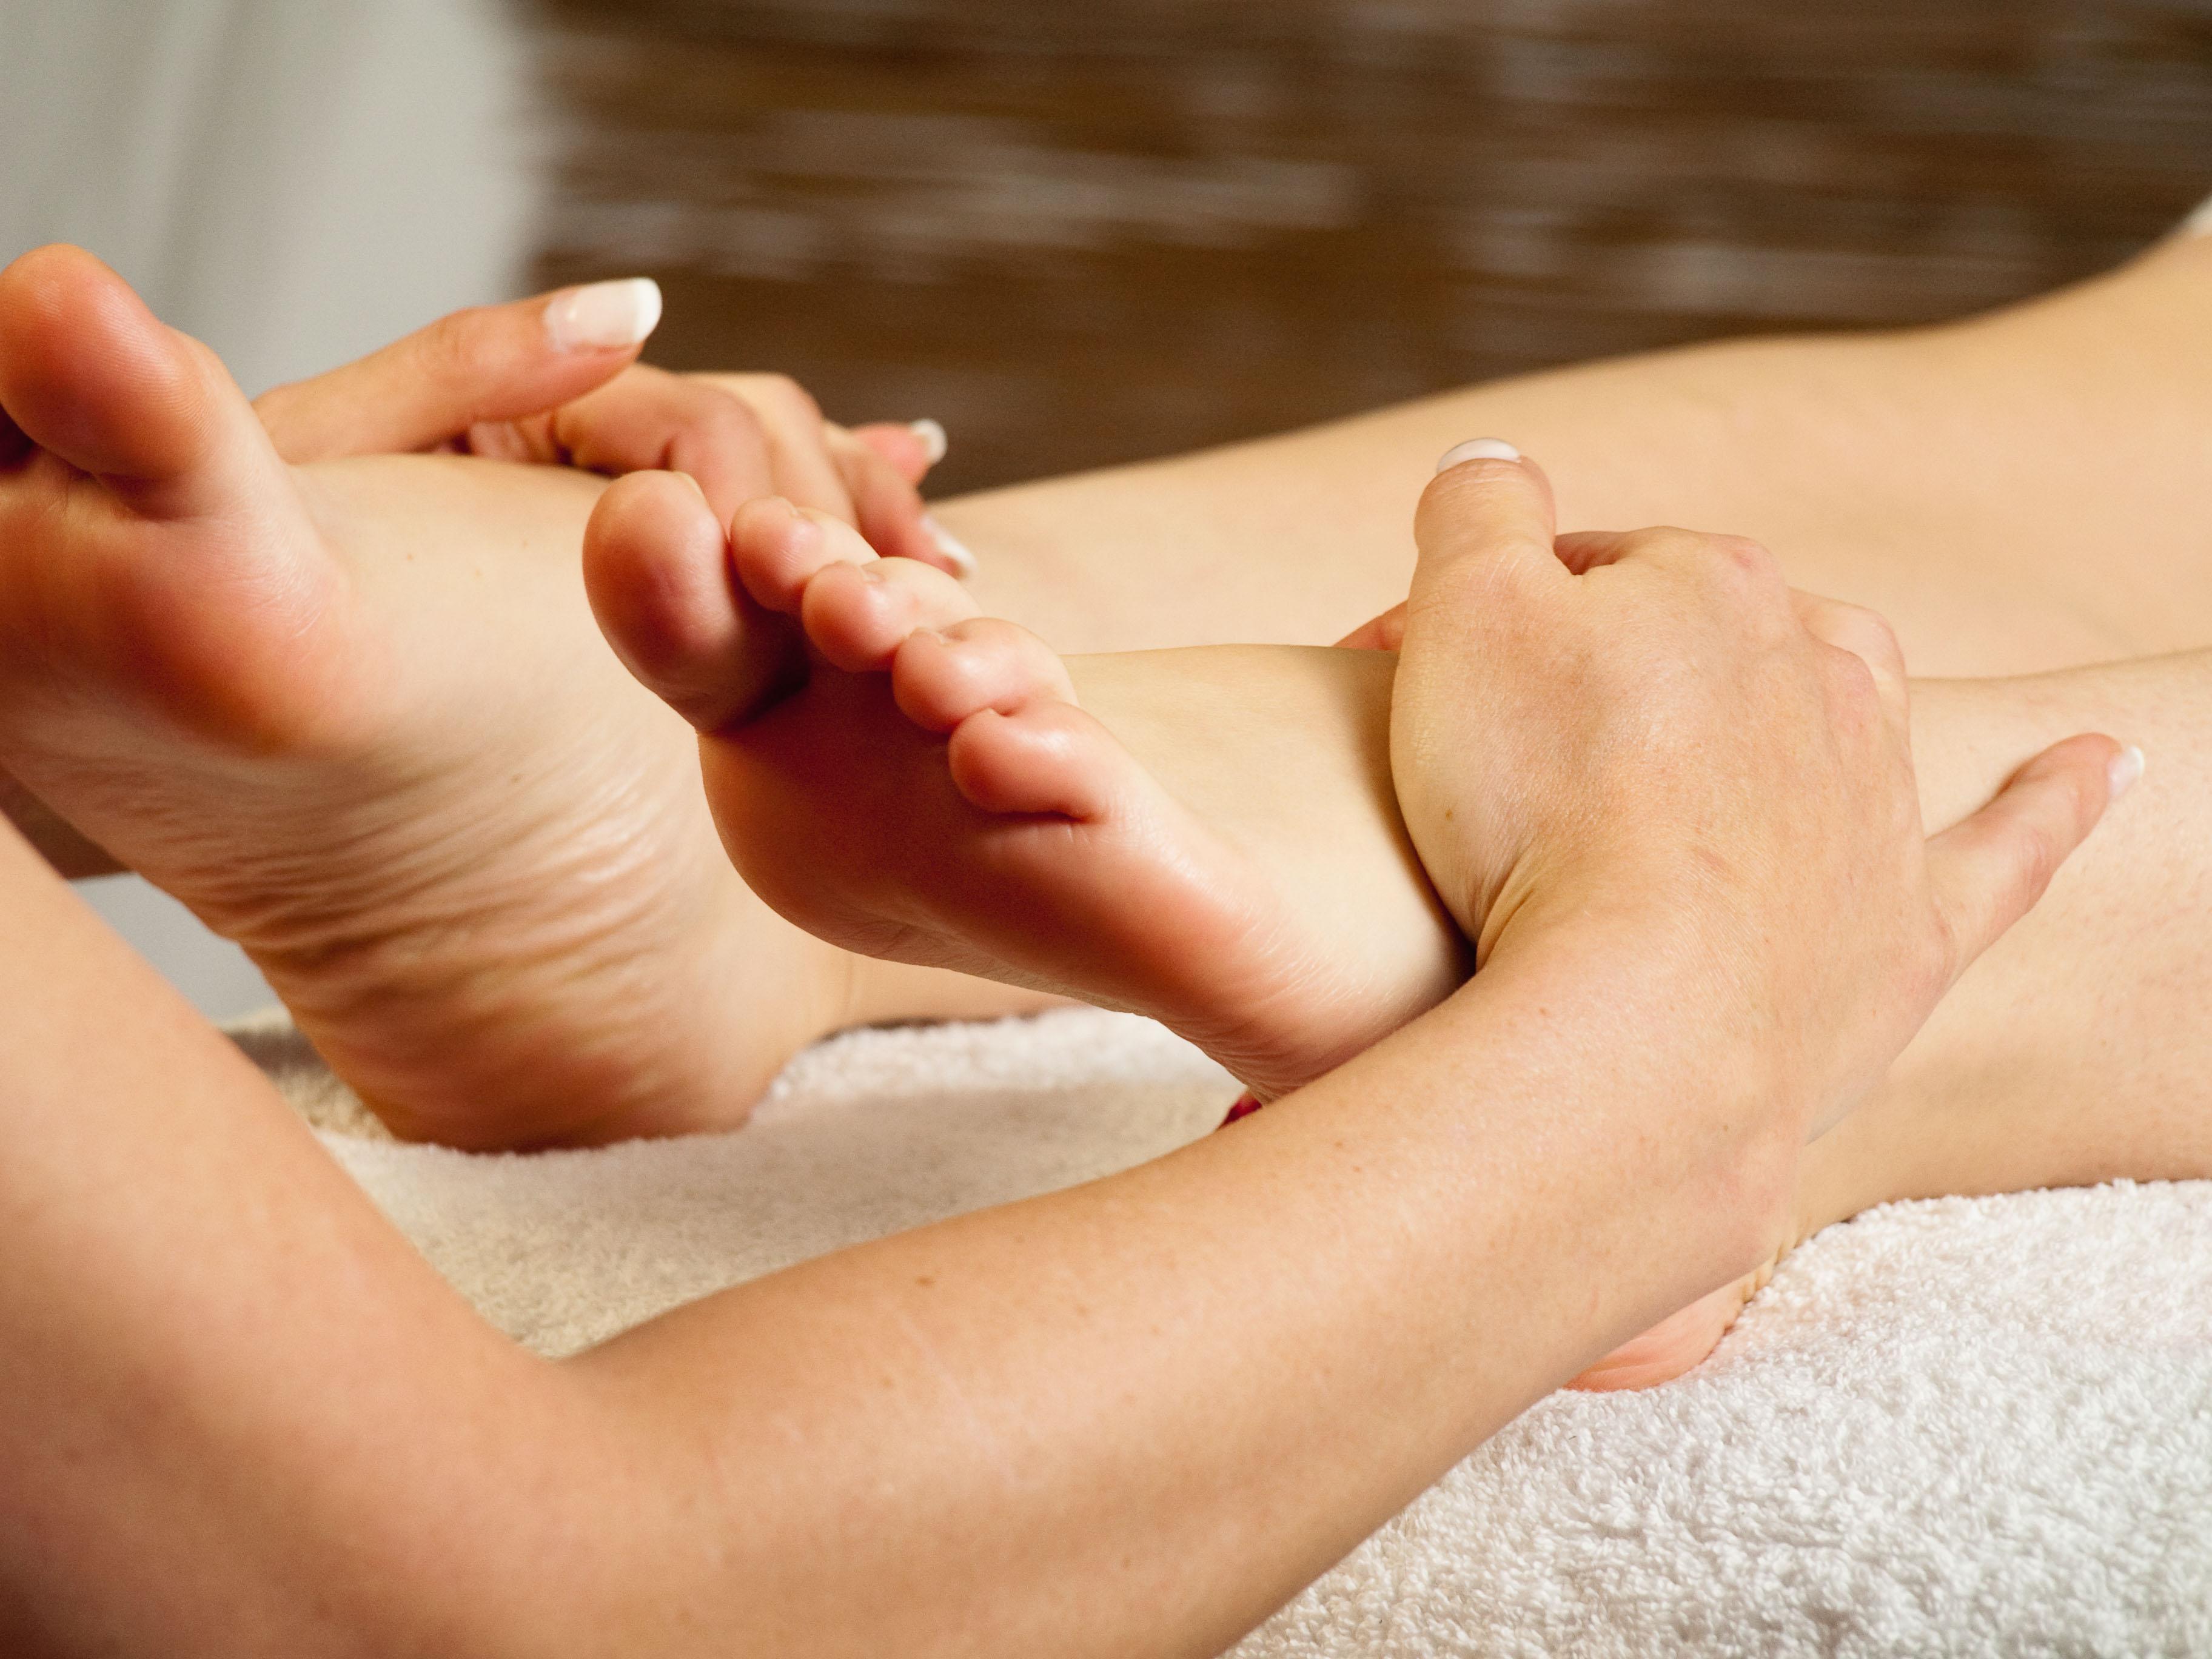 Romanian escort agency bilder tantra massage